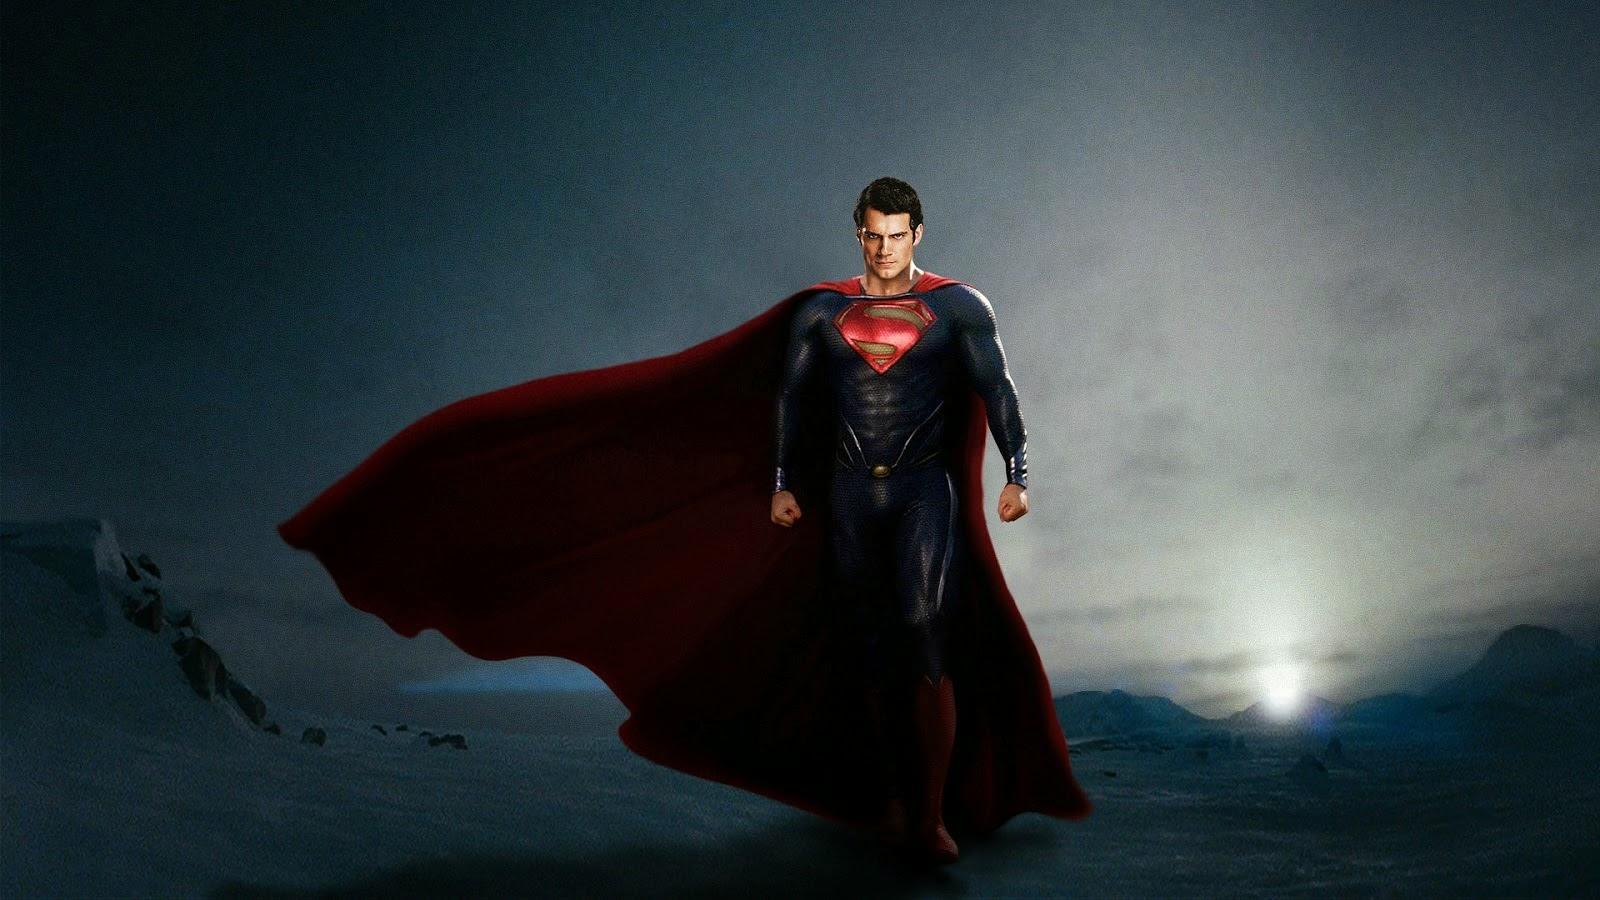 5 Personagens que derrotariam o Superman